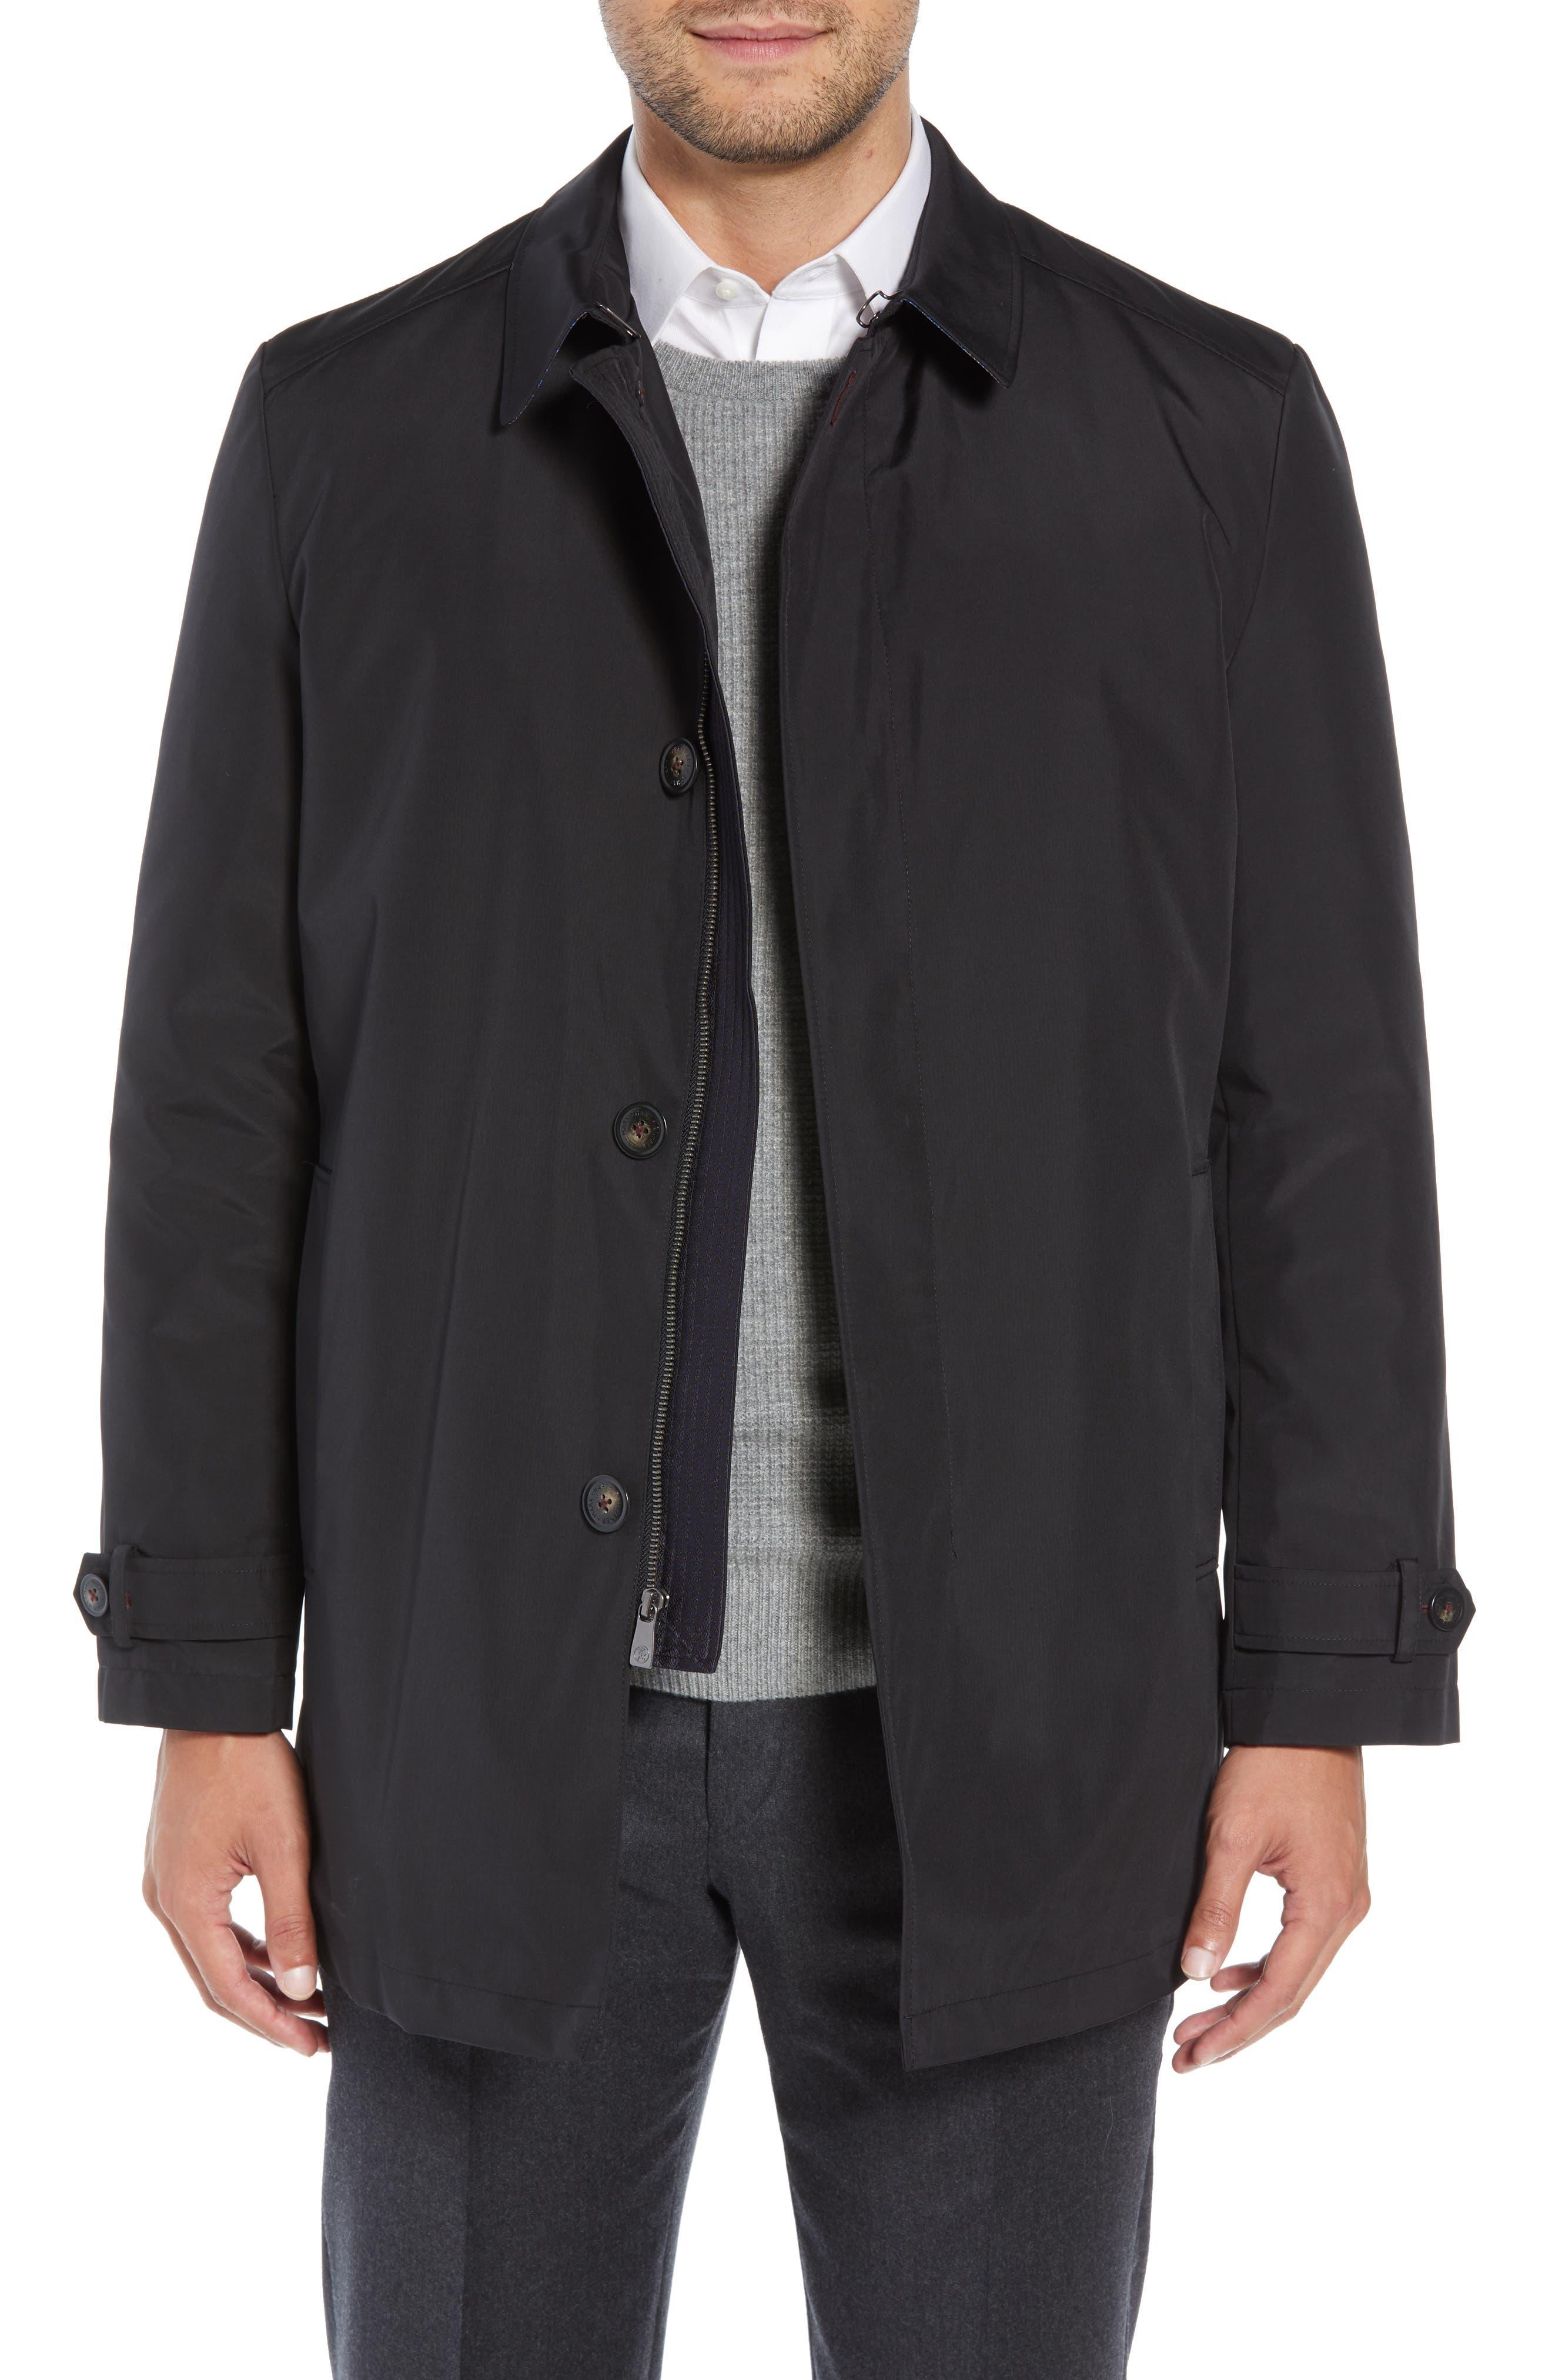 Rain-Down Rain Coat,                             Main thumbnail 1, color,                             BLACK